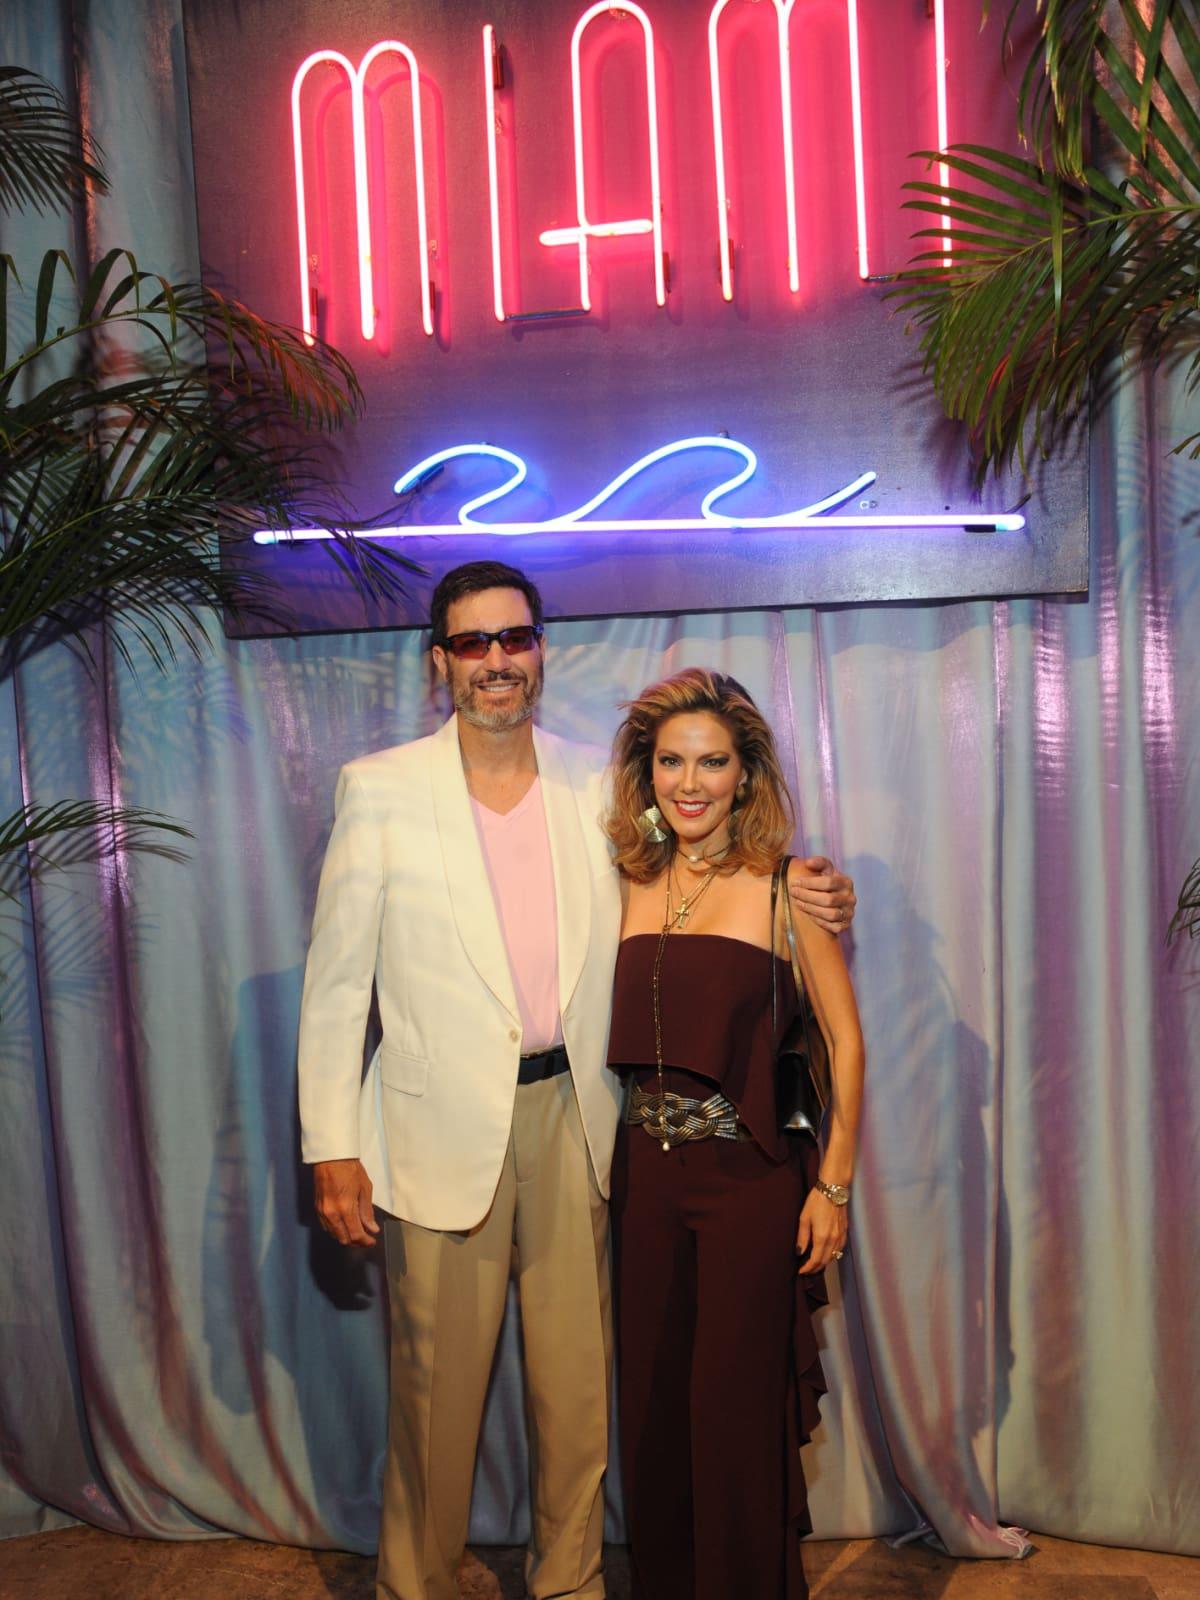 Vuk and Ofelia Vujasinovic at Miami Vice Children's Museum Gala